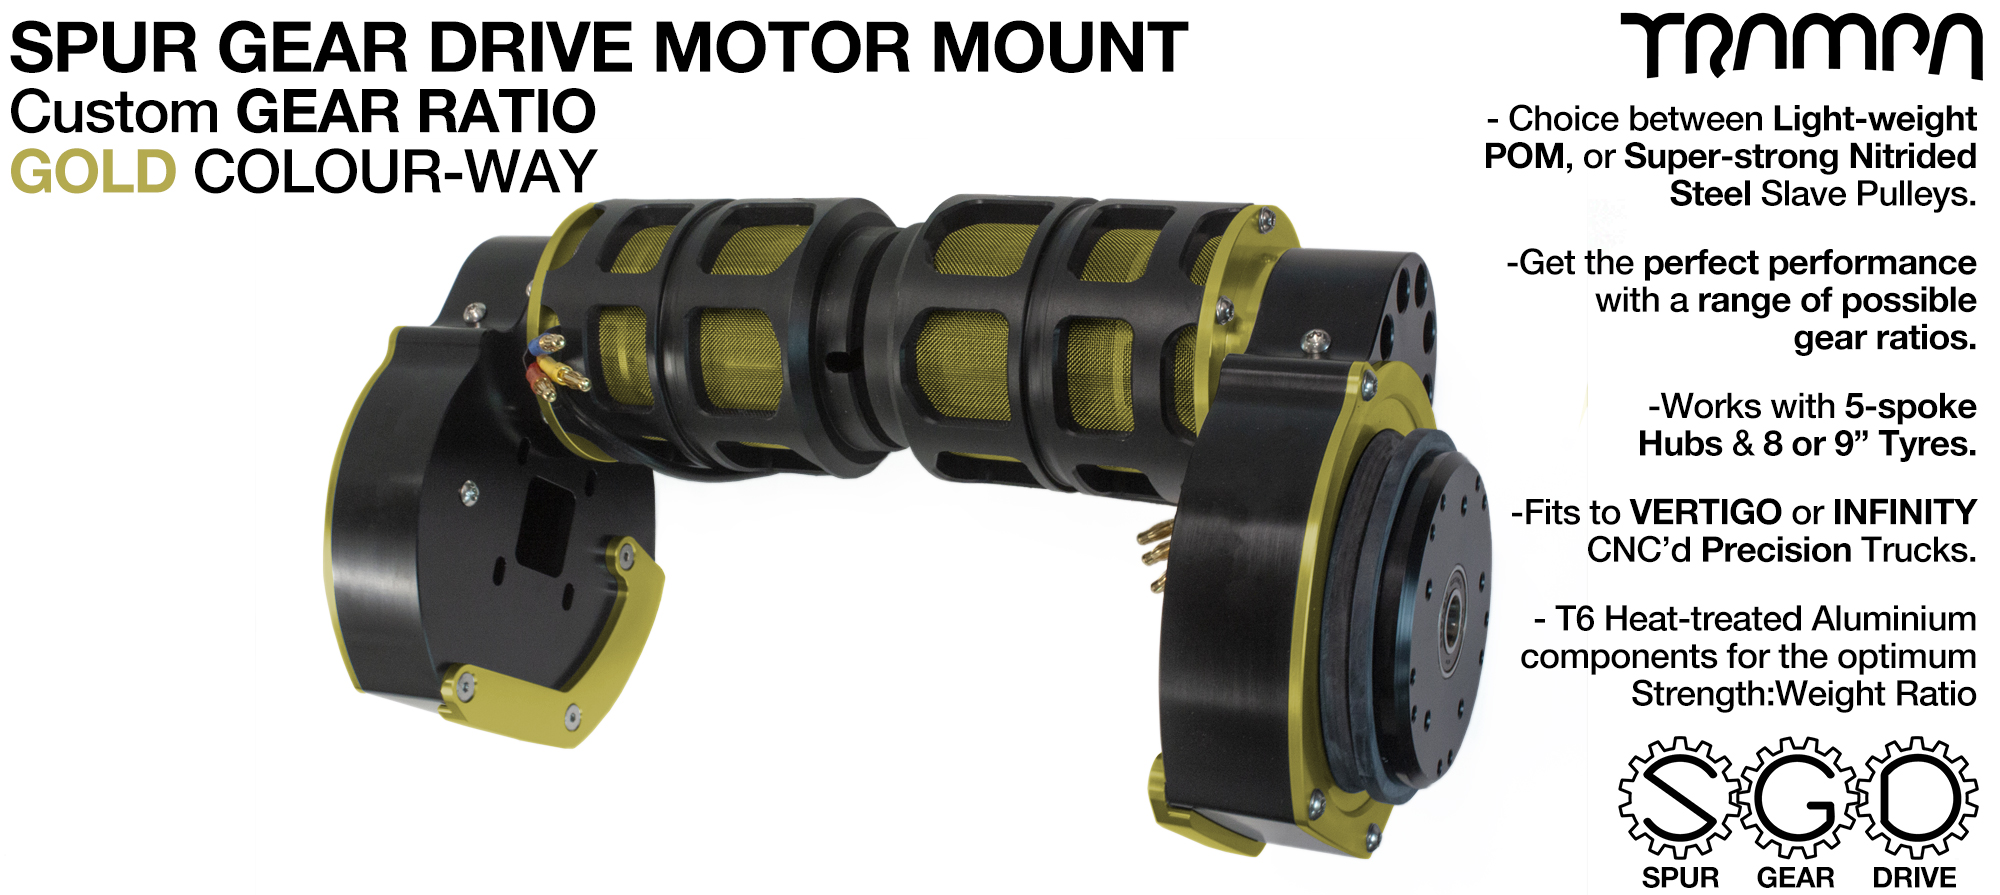 Mountainboard Spur Gear Drive TWIN Motor Mount - GOLD